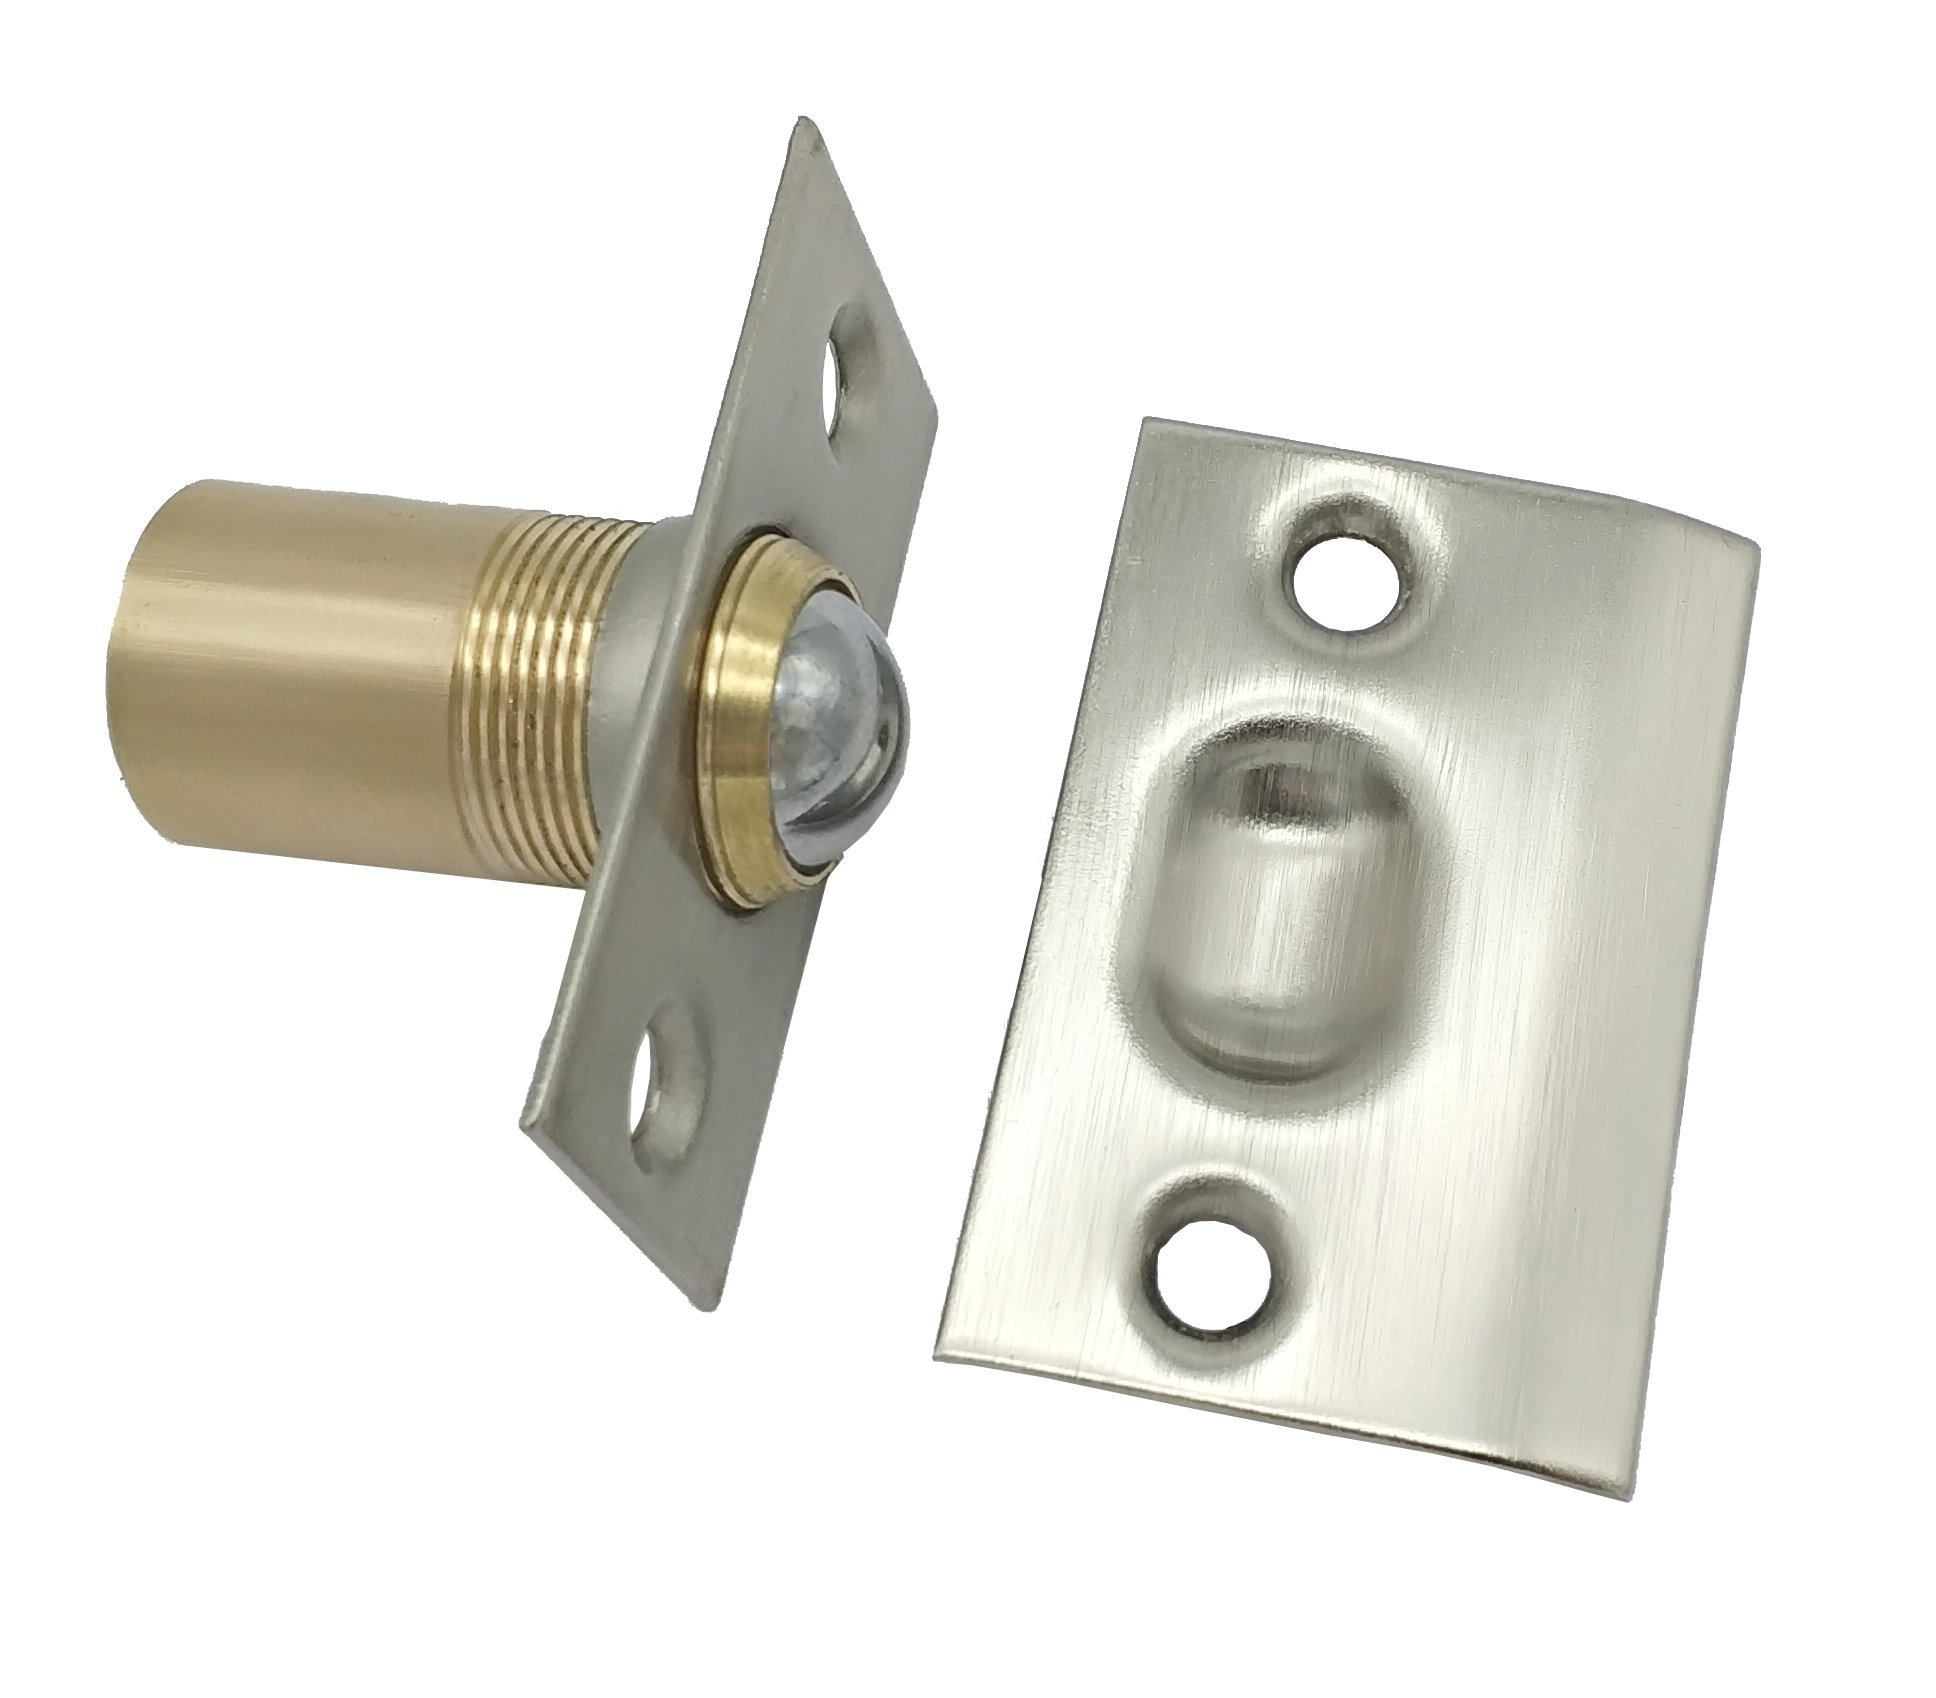 META Hardware Adjustable Cabinet/Closet/Door Large Ball Catch, with Strike& Screws, 2-1/8 inch, Satin Nickel (3 Pack)